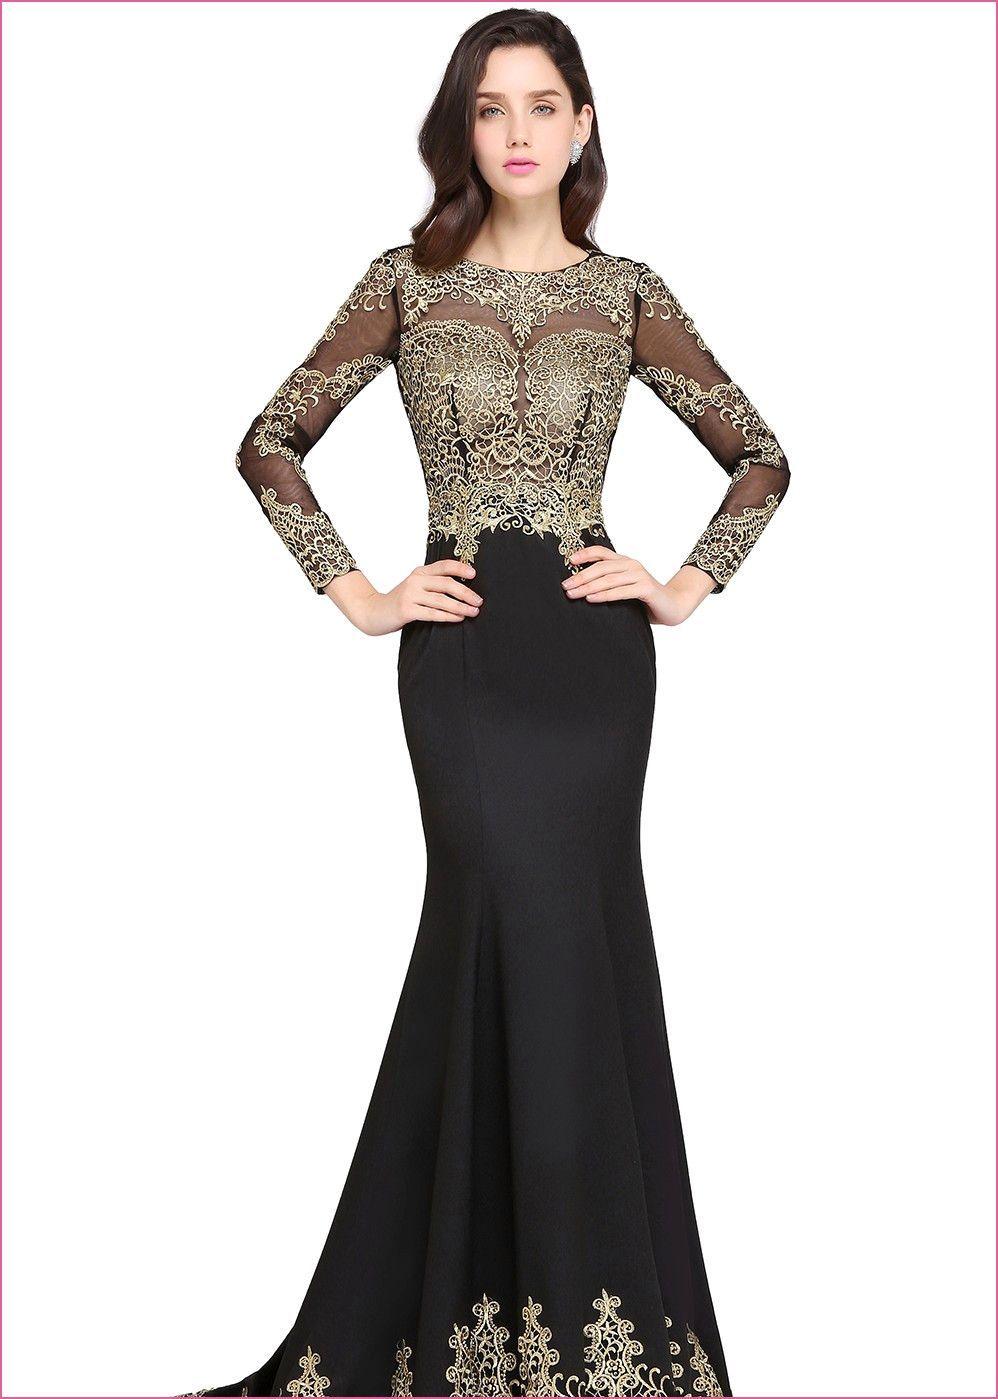 schwarzes kleid zalando in 2020 | abendkleid, kleid zalando